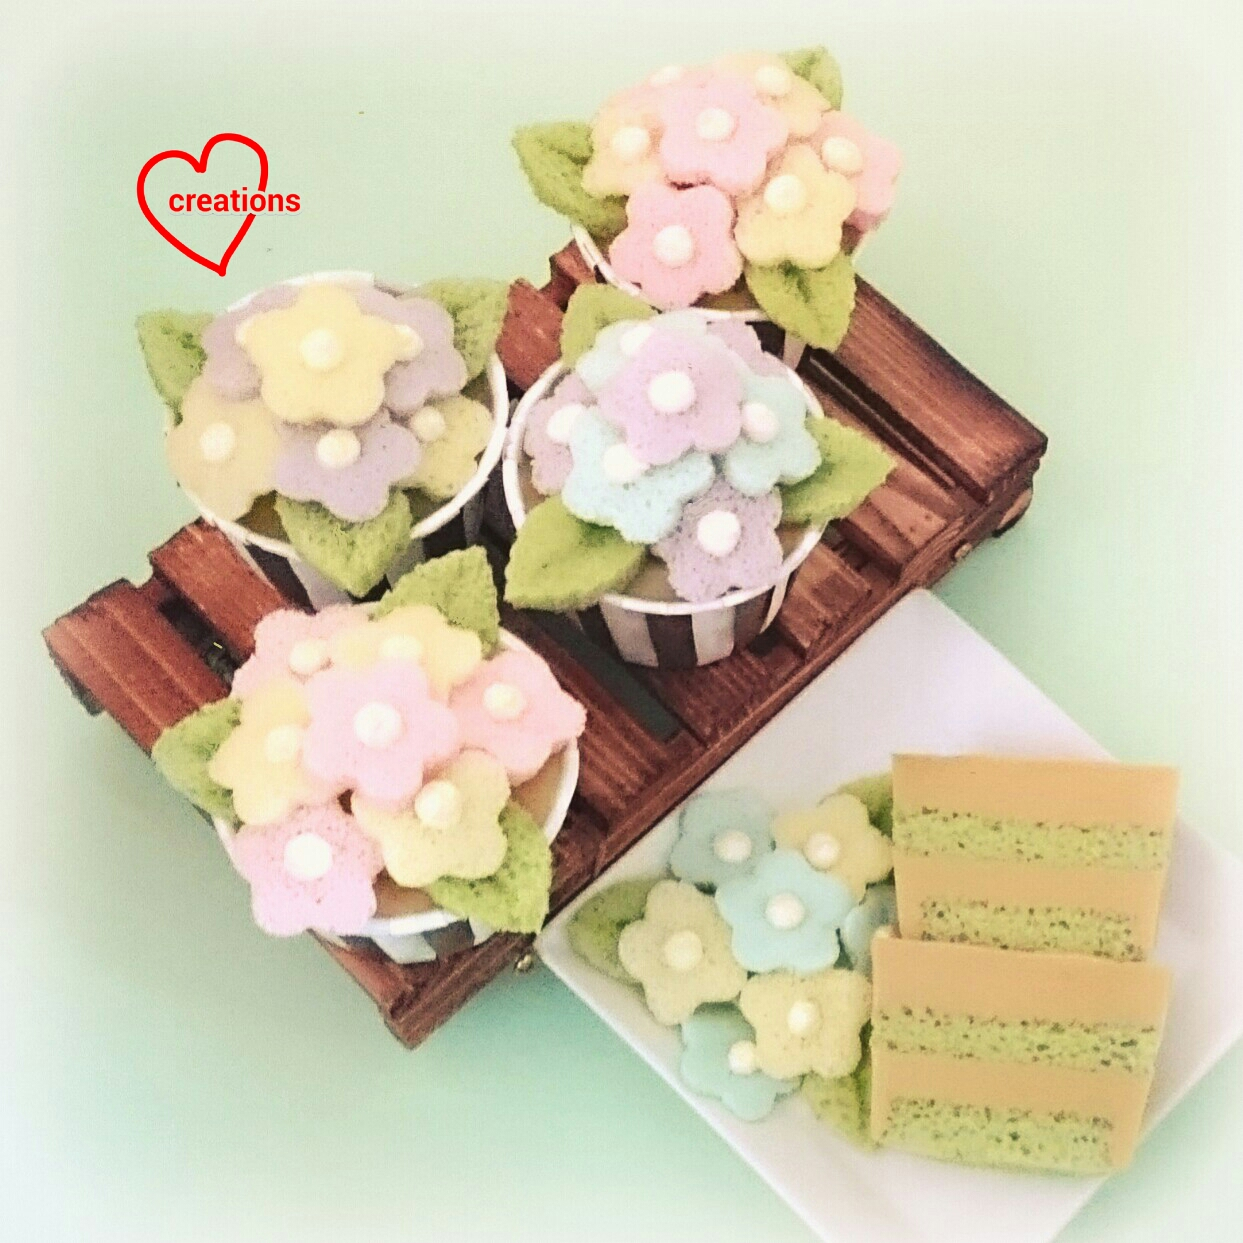 Loving Creations for You: Pandan Kaya Gula Melaka Flower Pot Cupcakes